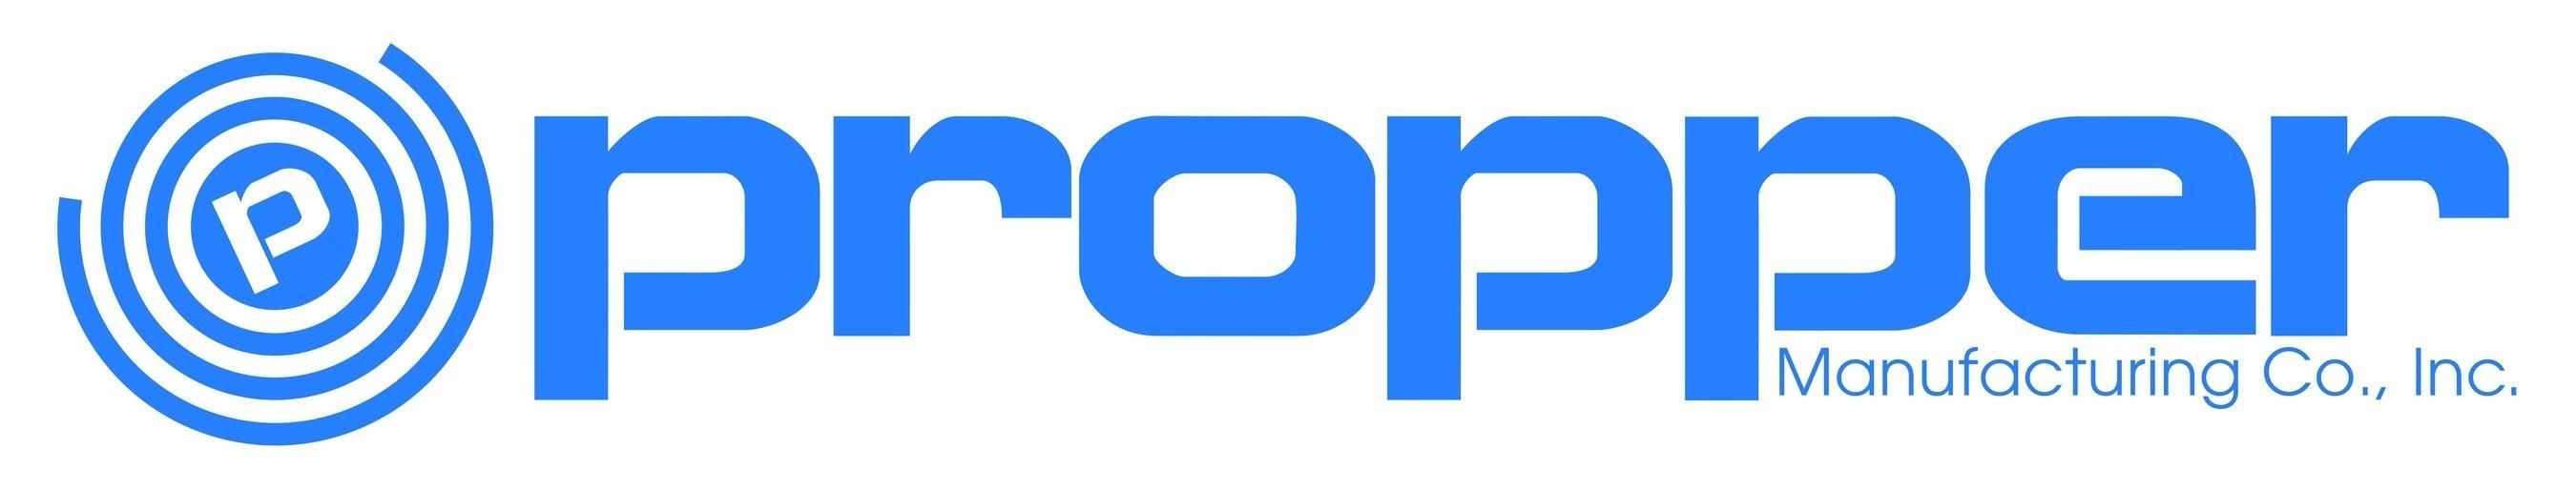 Propper Manufacturing Company Logo